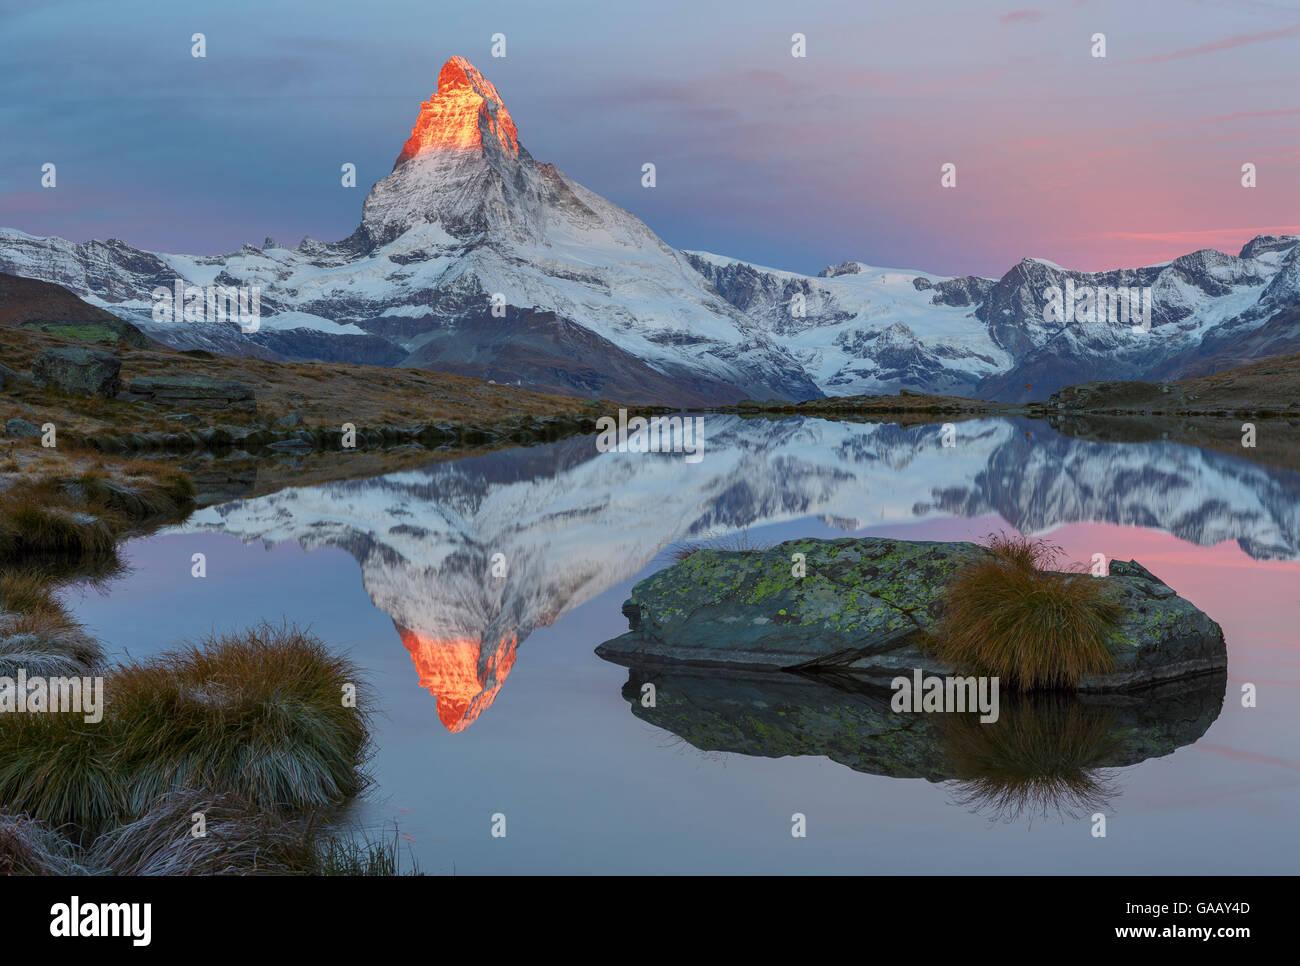 Matterhorn (4,478m) at sunrise, with reflection in Lake Stellisee, Zermatt, Switzerland, September 2012. - Stock Image